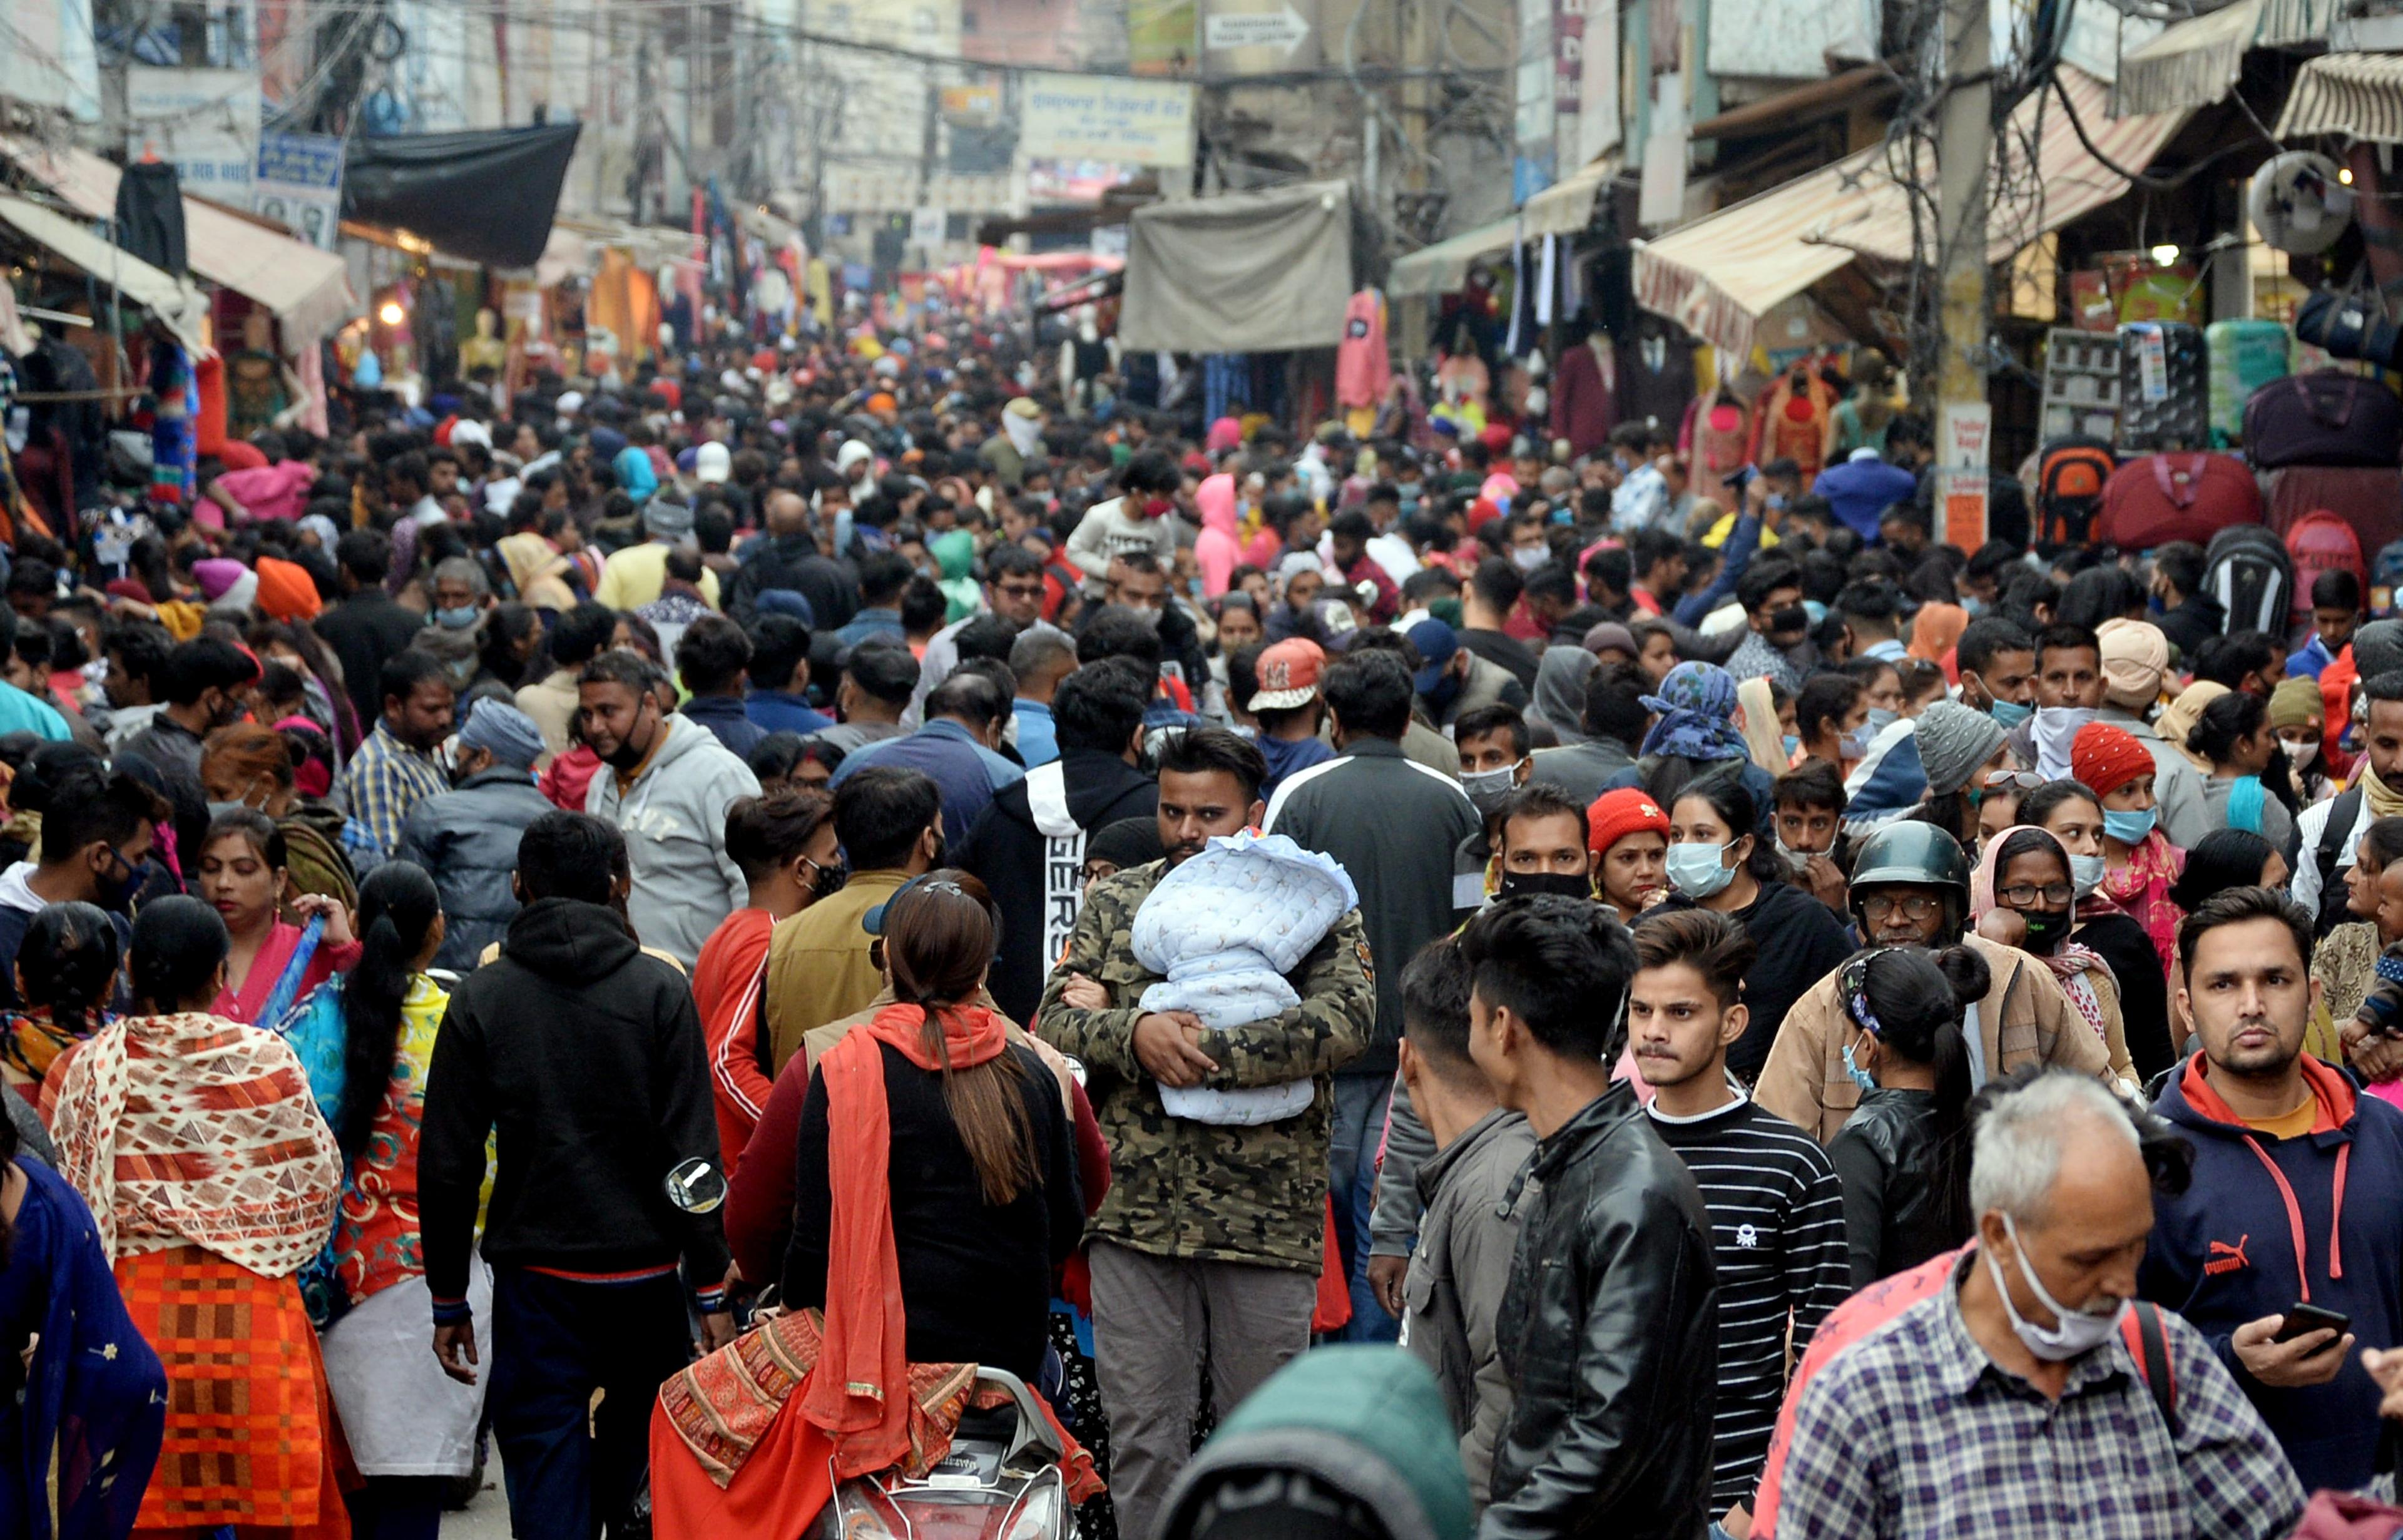 Soaring prices dampen consumer mood in India's festival season